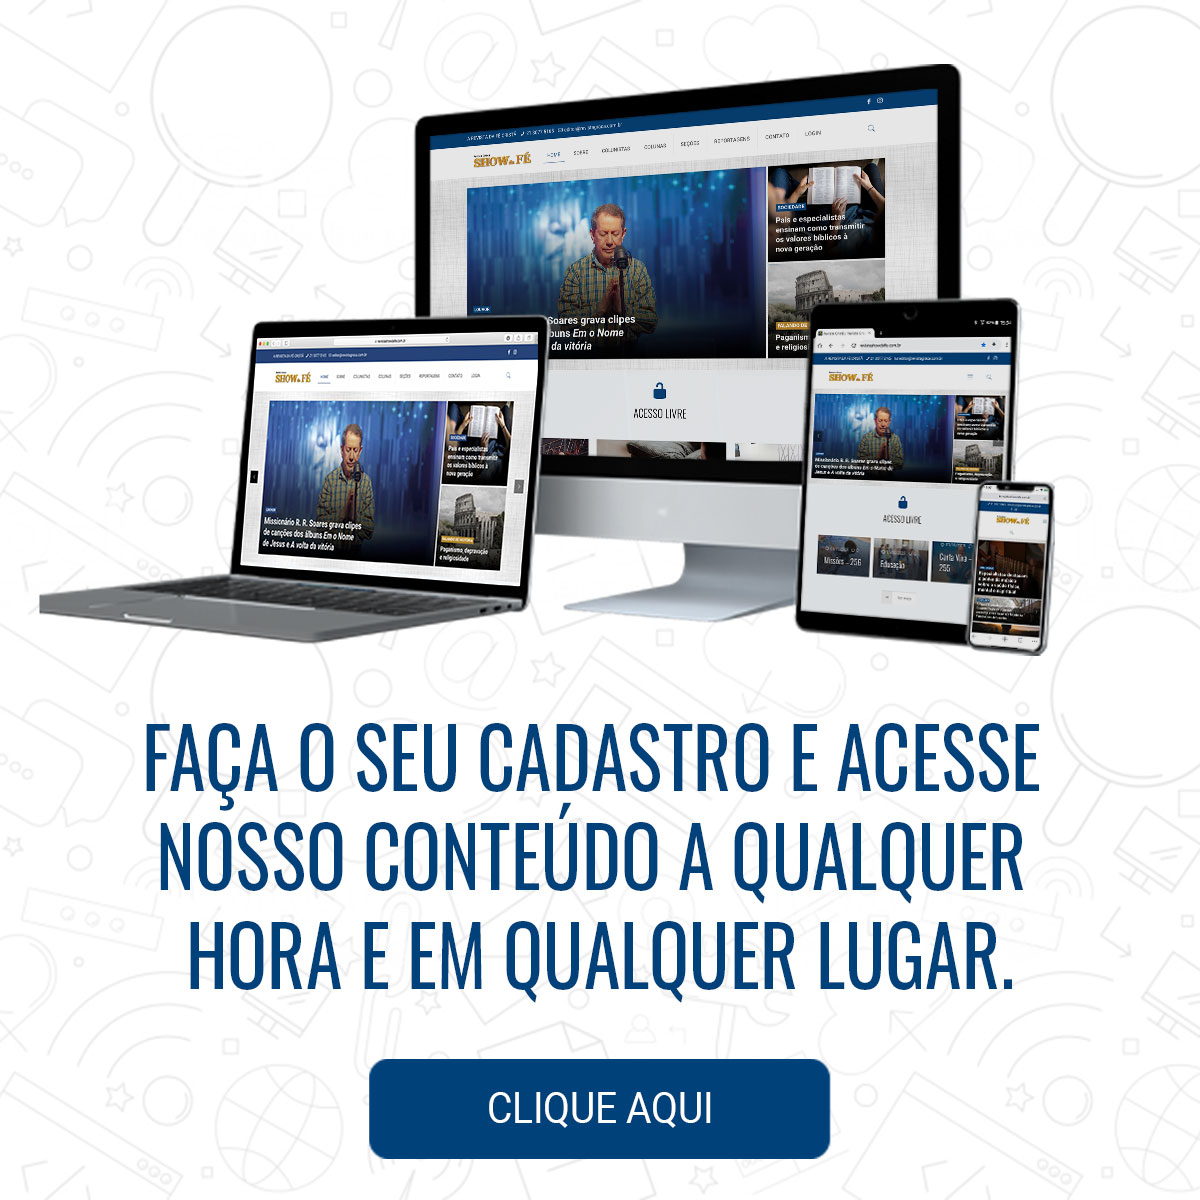 anuncio-revista-graca-home-mobile